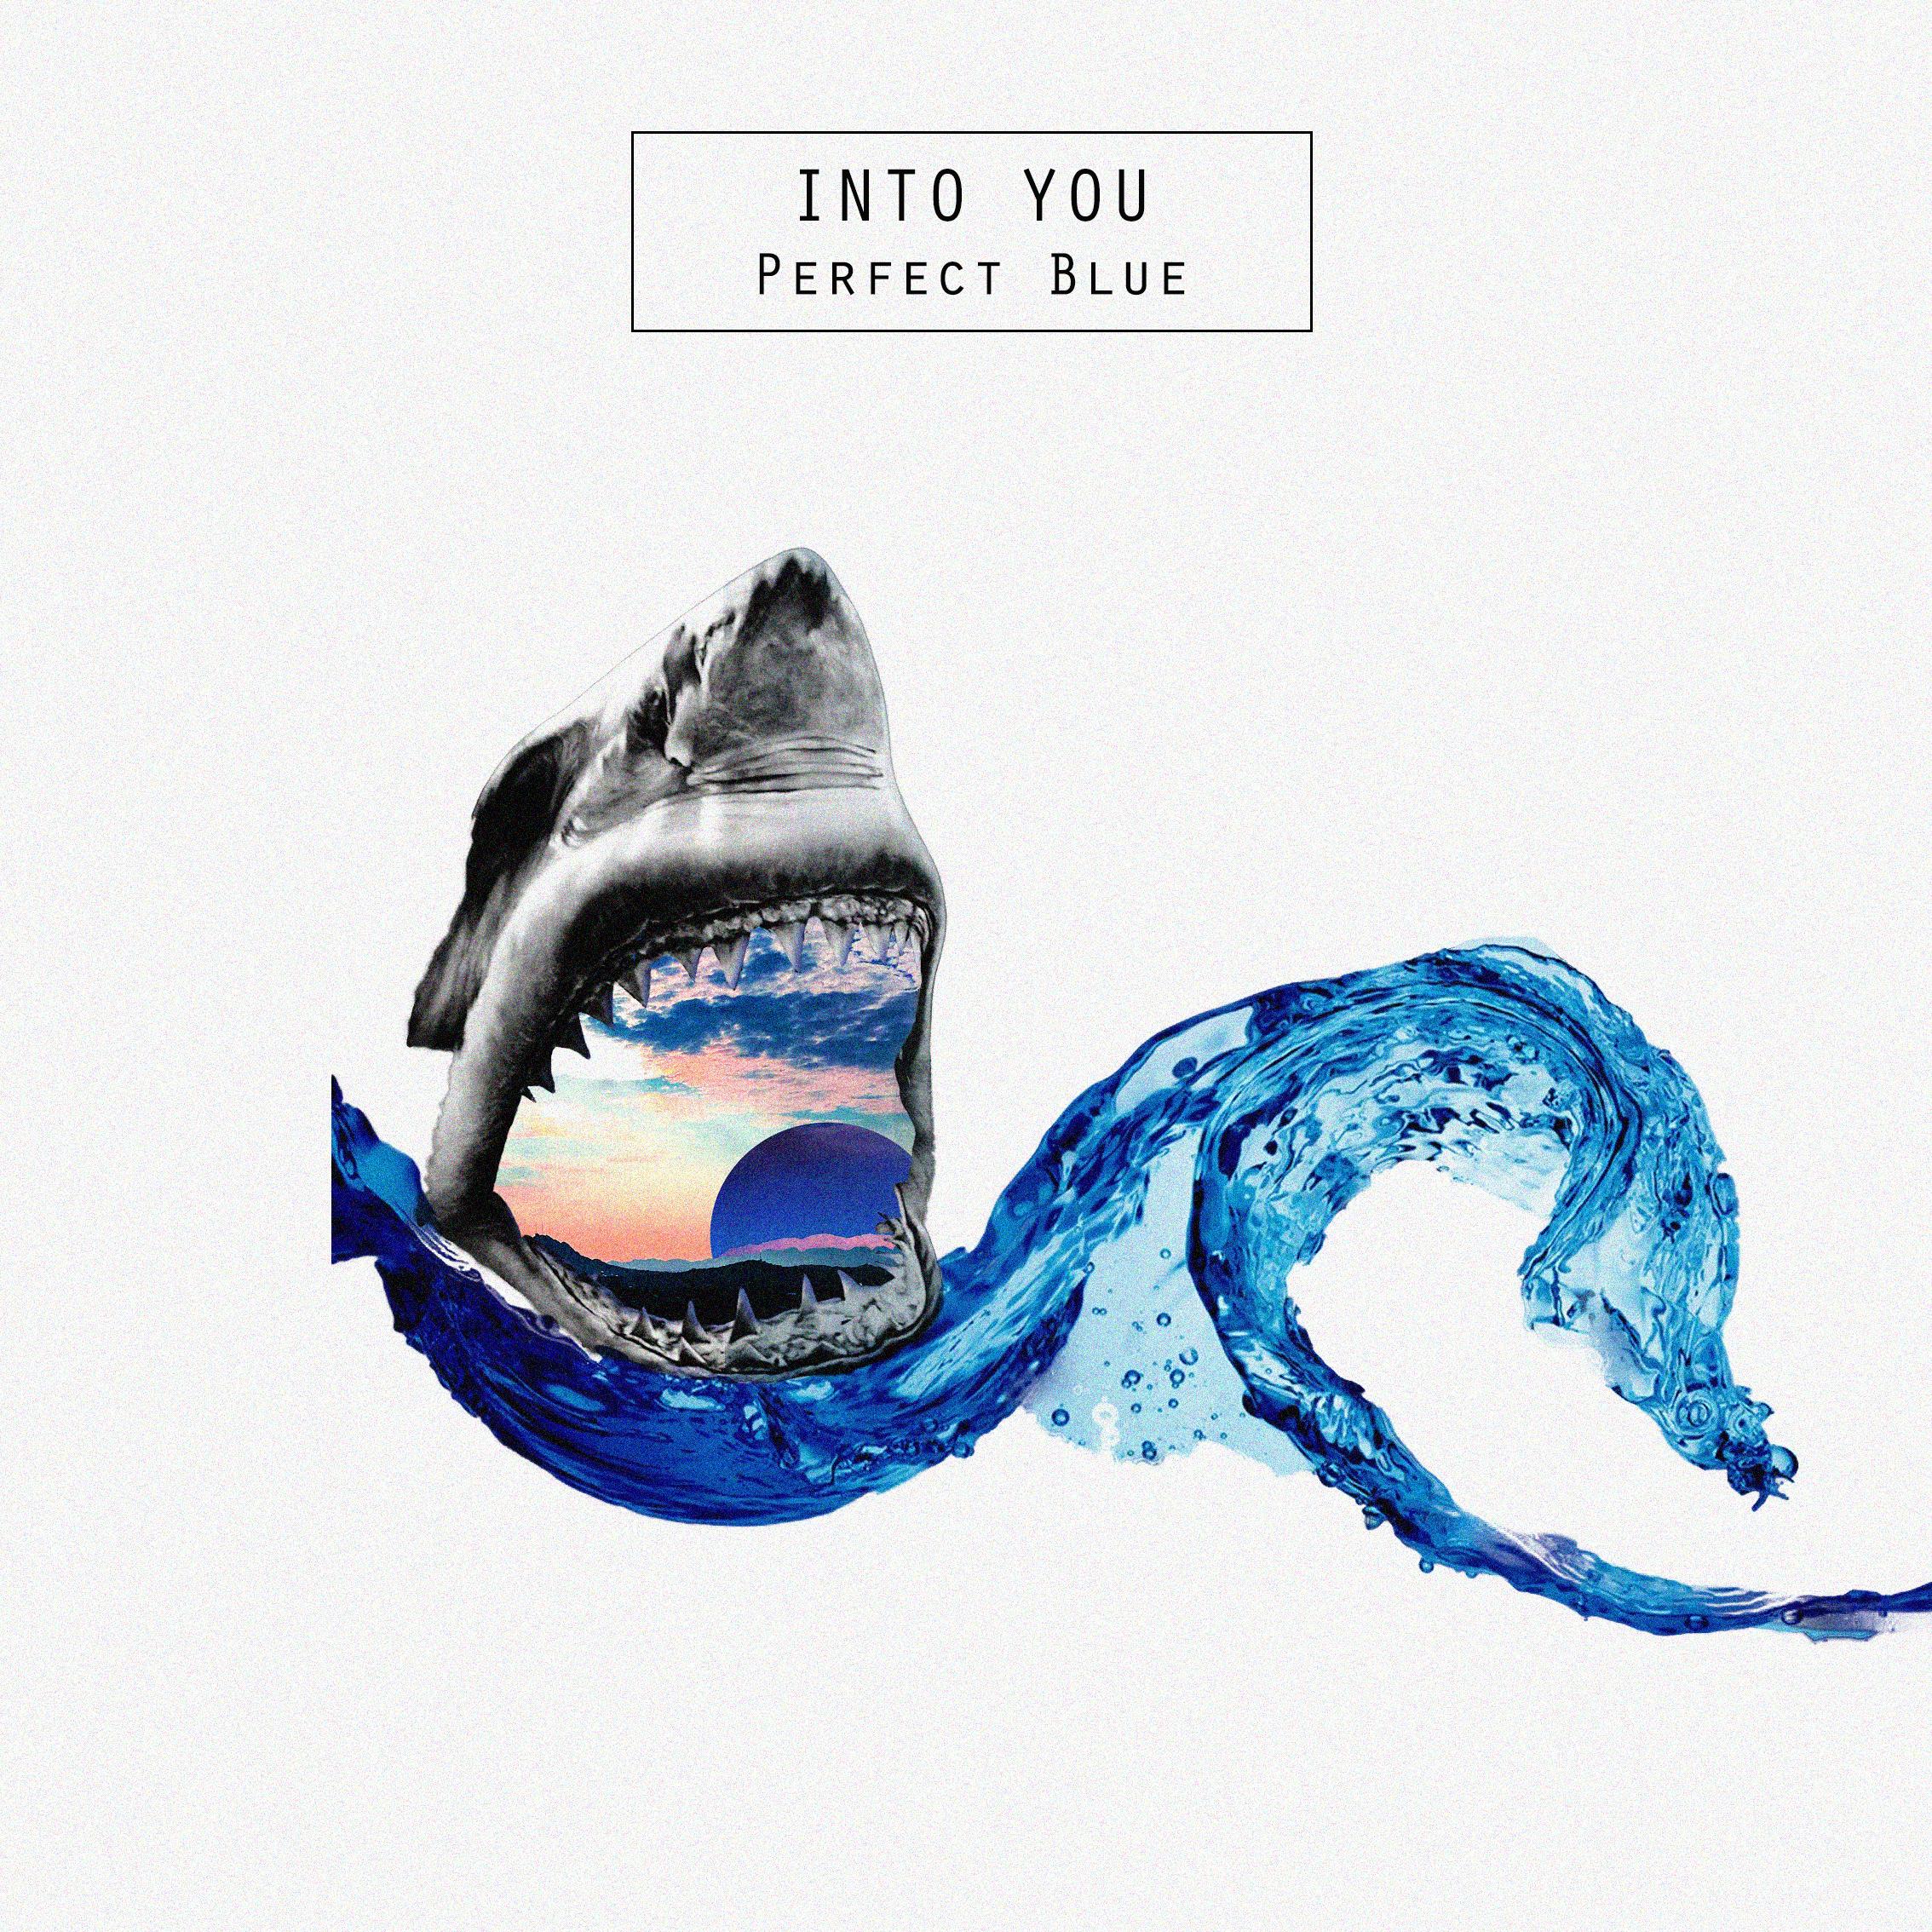 perfect_blu_shark_water_last.jpg